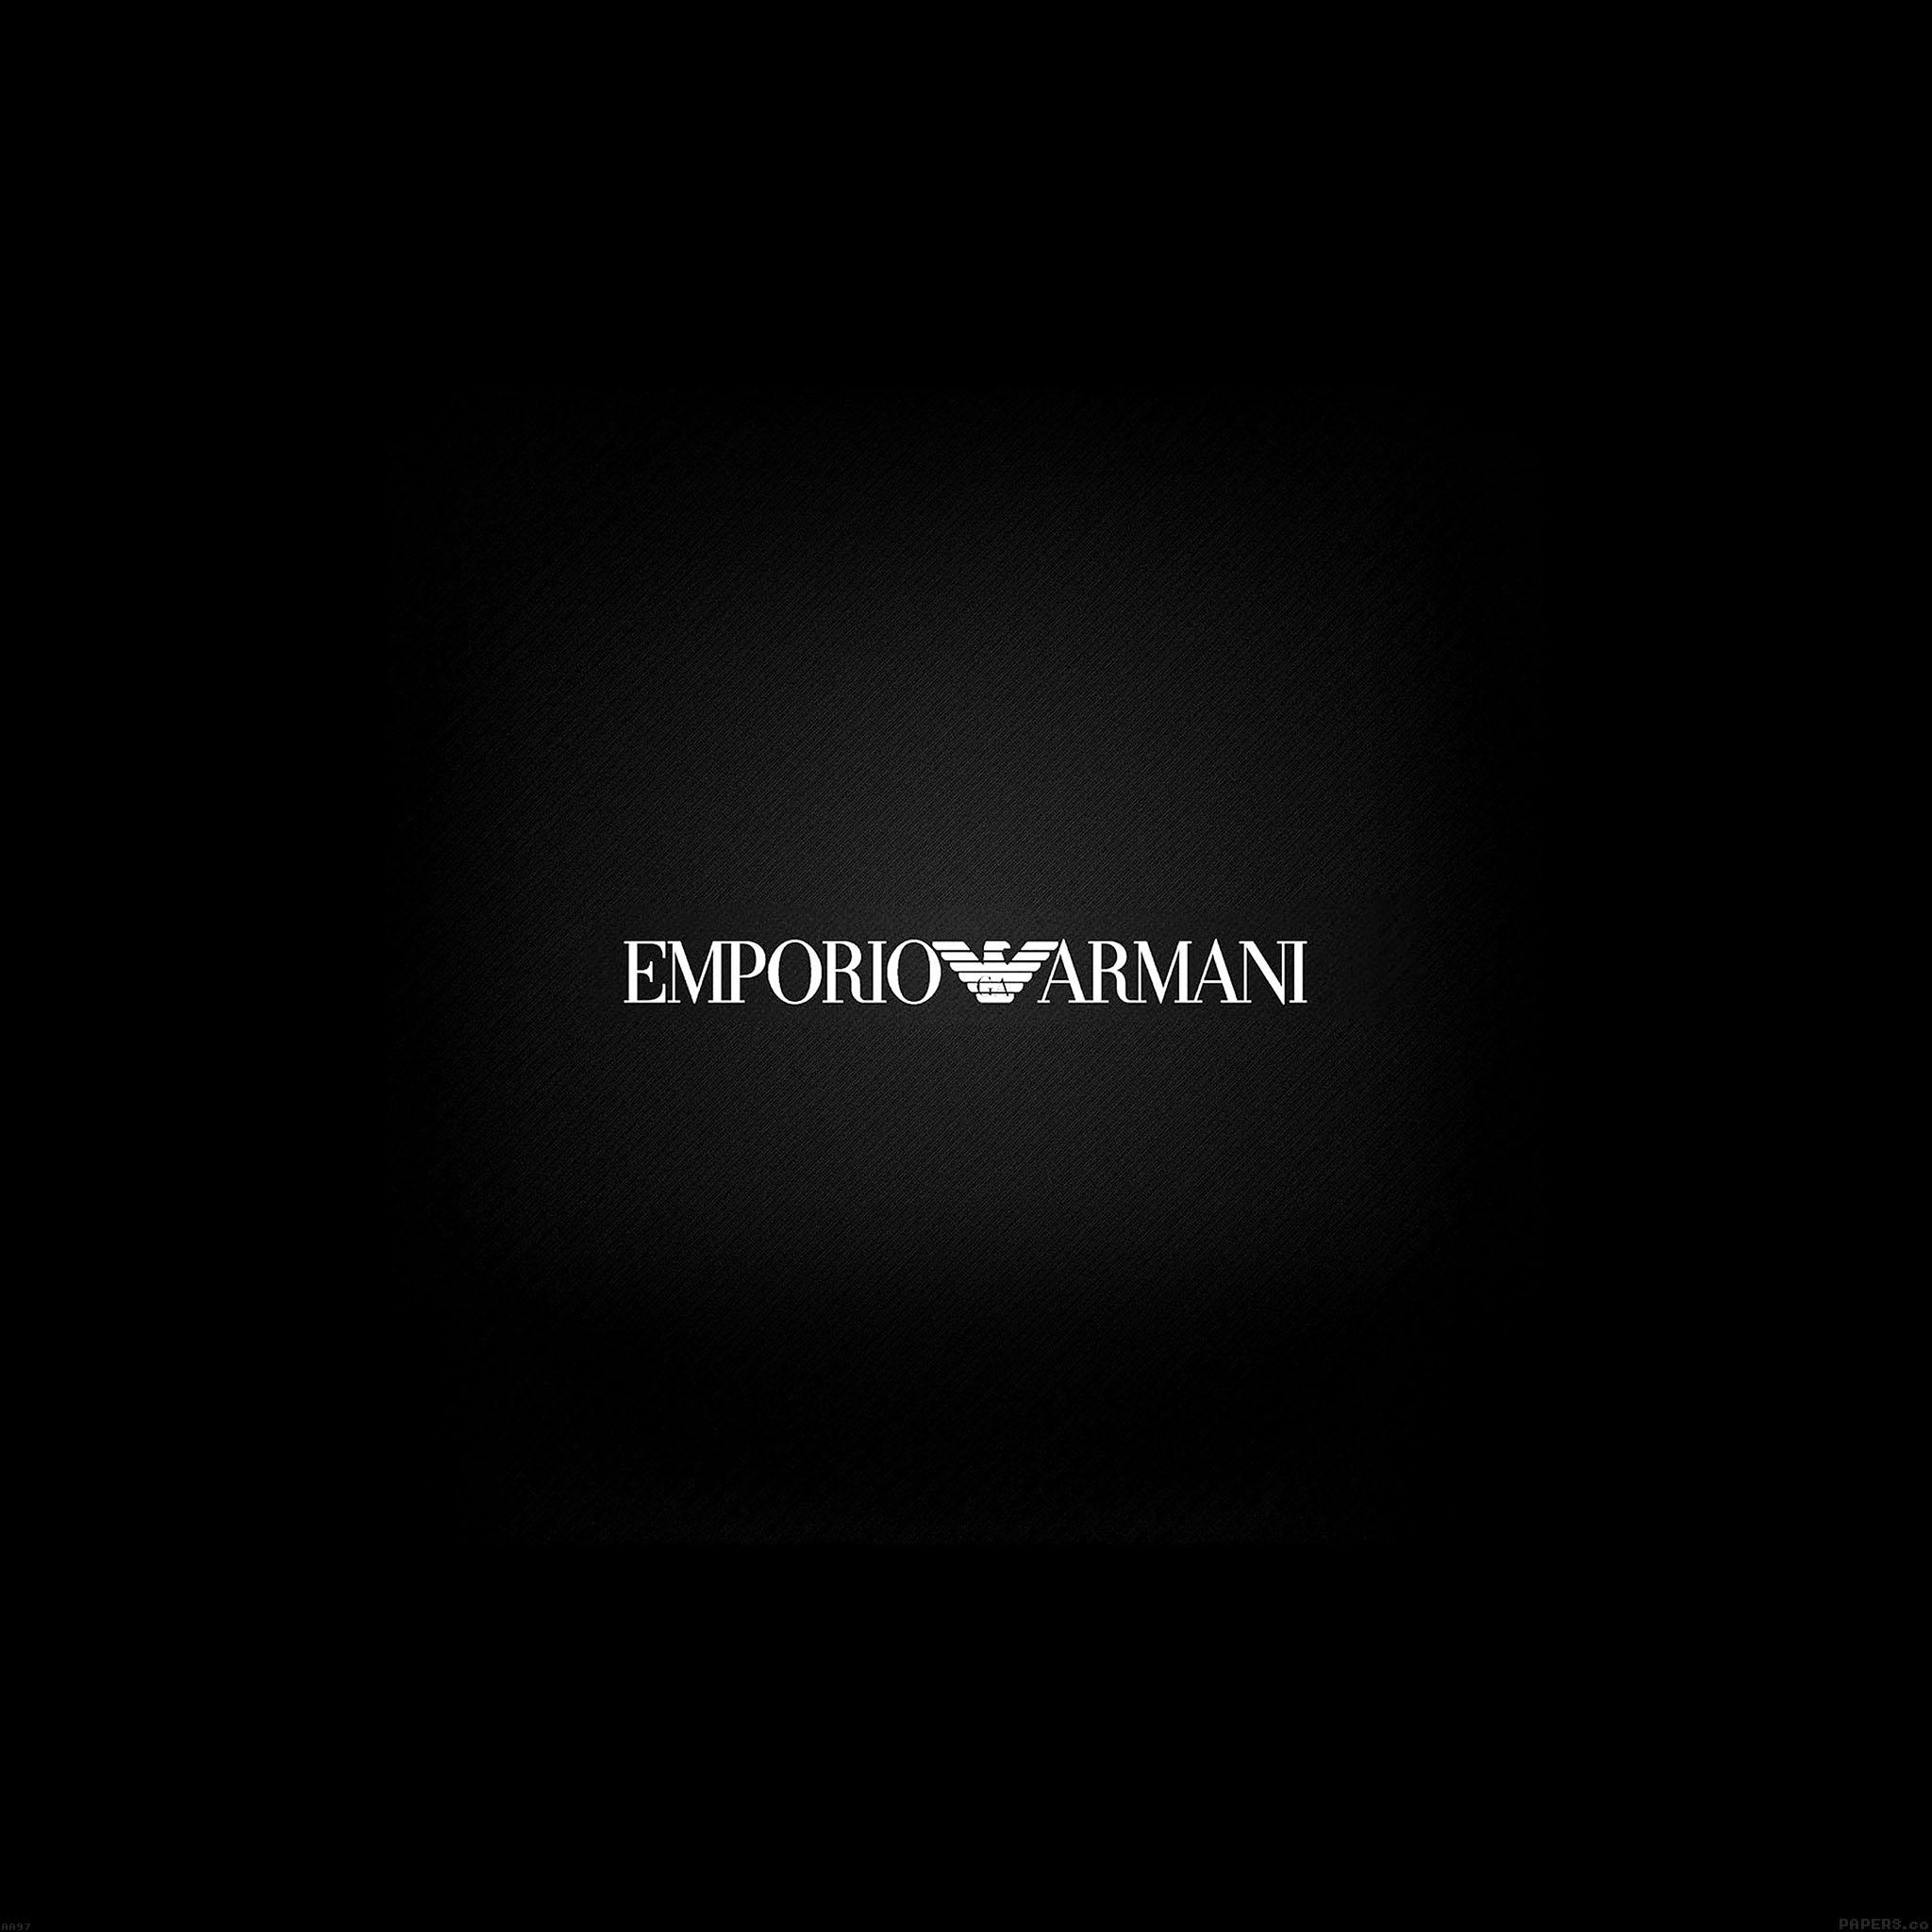 Ipad - Emporio giorgio armani logo ...